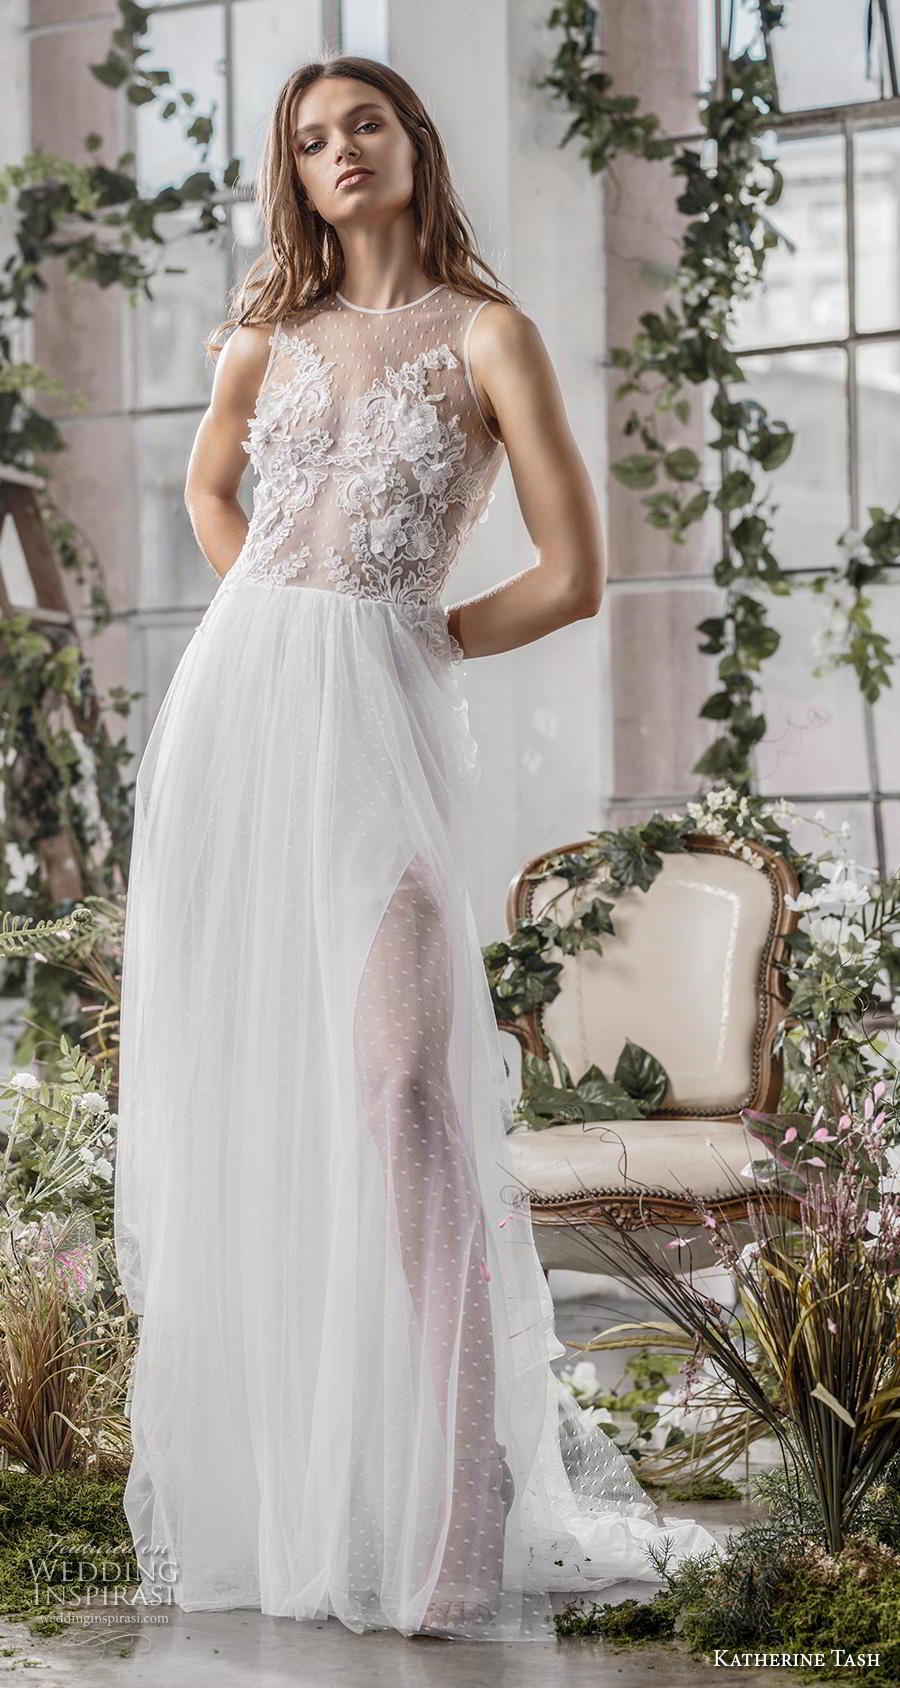 katherine tash fall 2019 bridal sleeveless jewel neck heavily embellished bodice tulle slit skirt romantic soft a  line wedding dress (2) mv